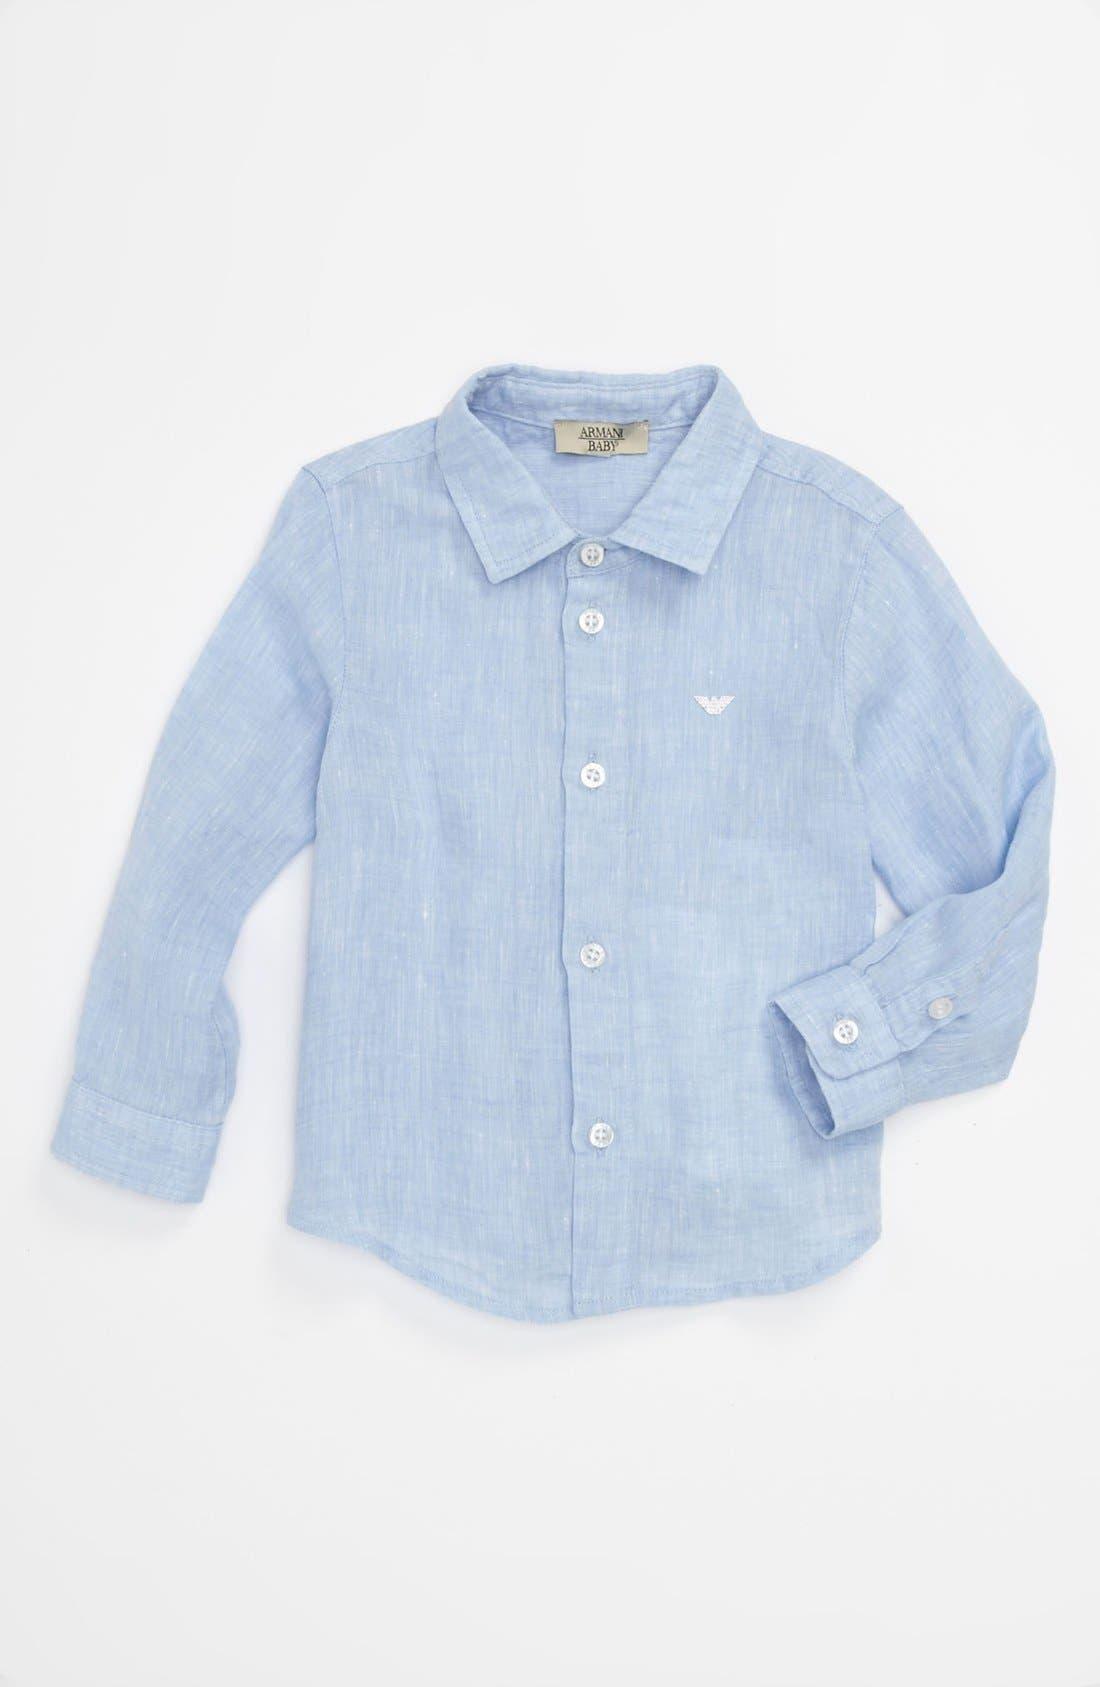 Alternate Image 1 Selected - Armani Junior Chambray Sport Shirt (Baby)